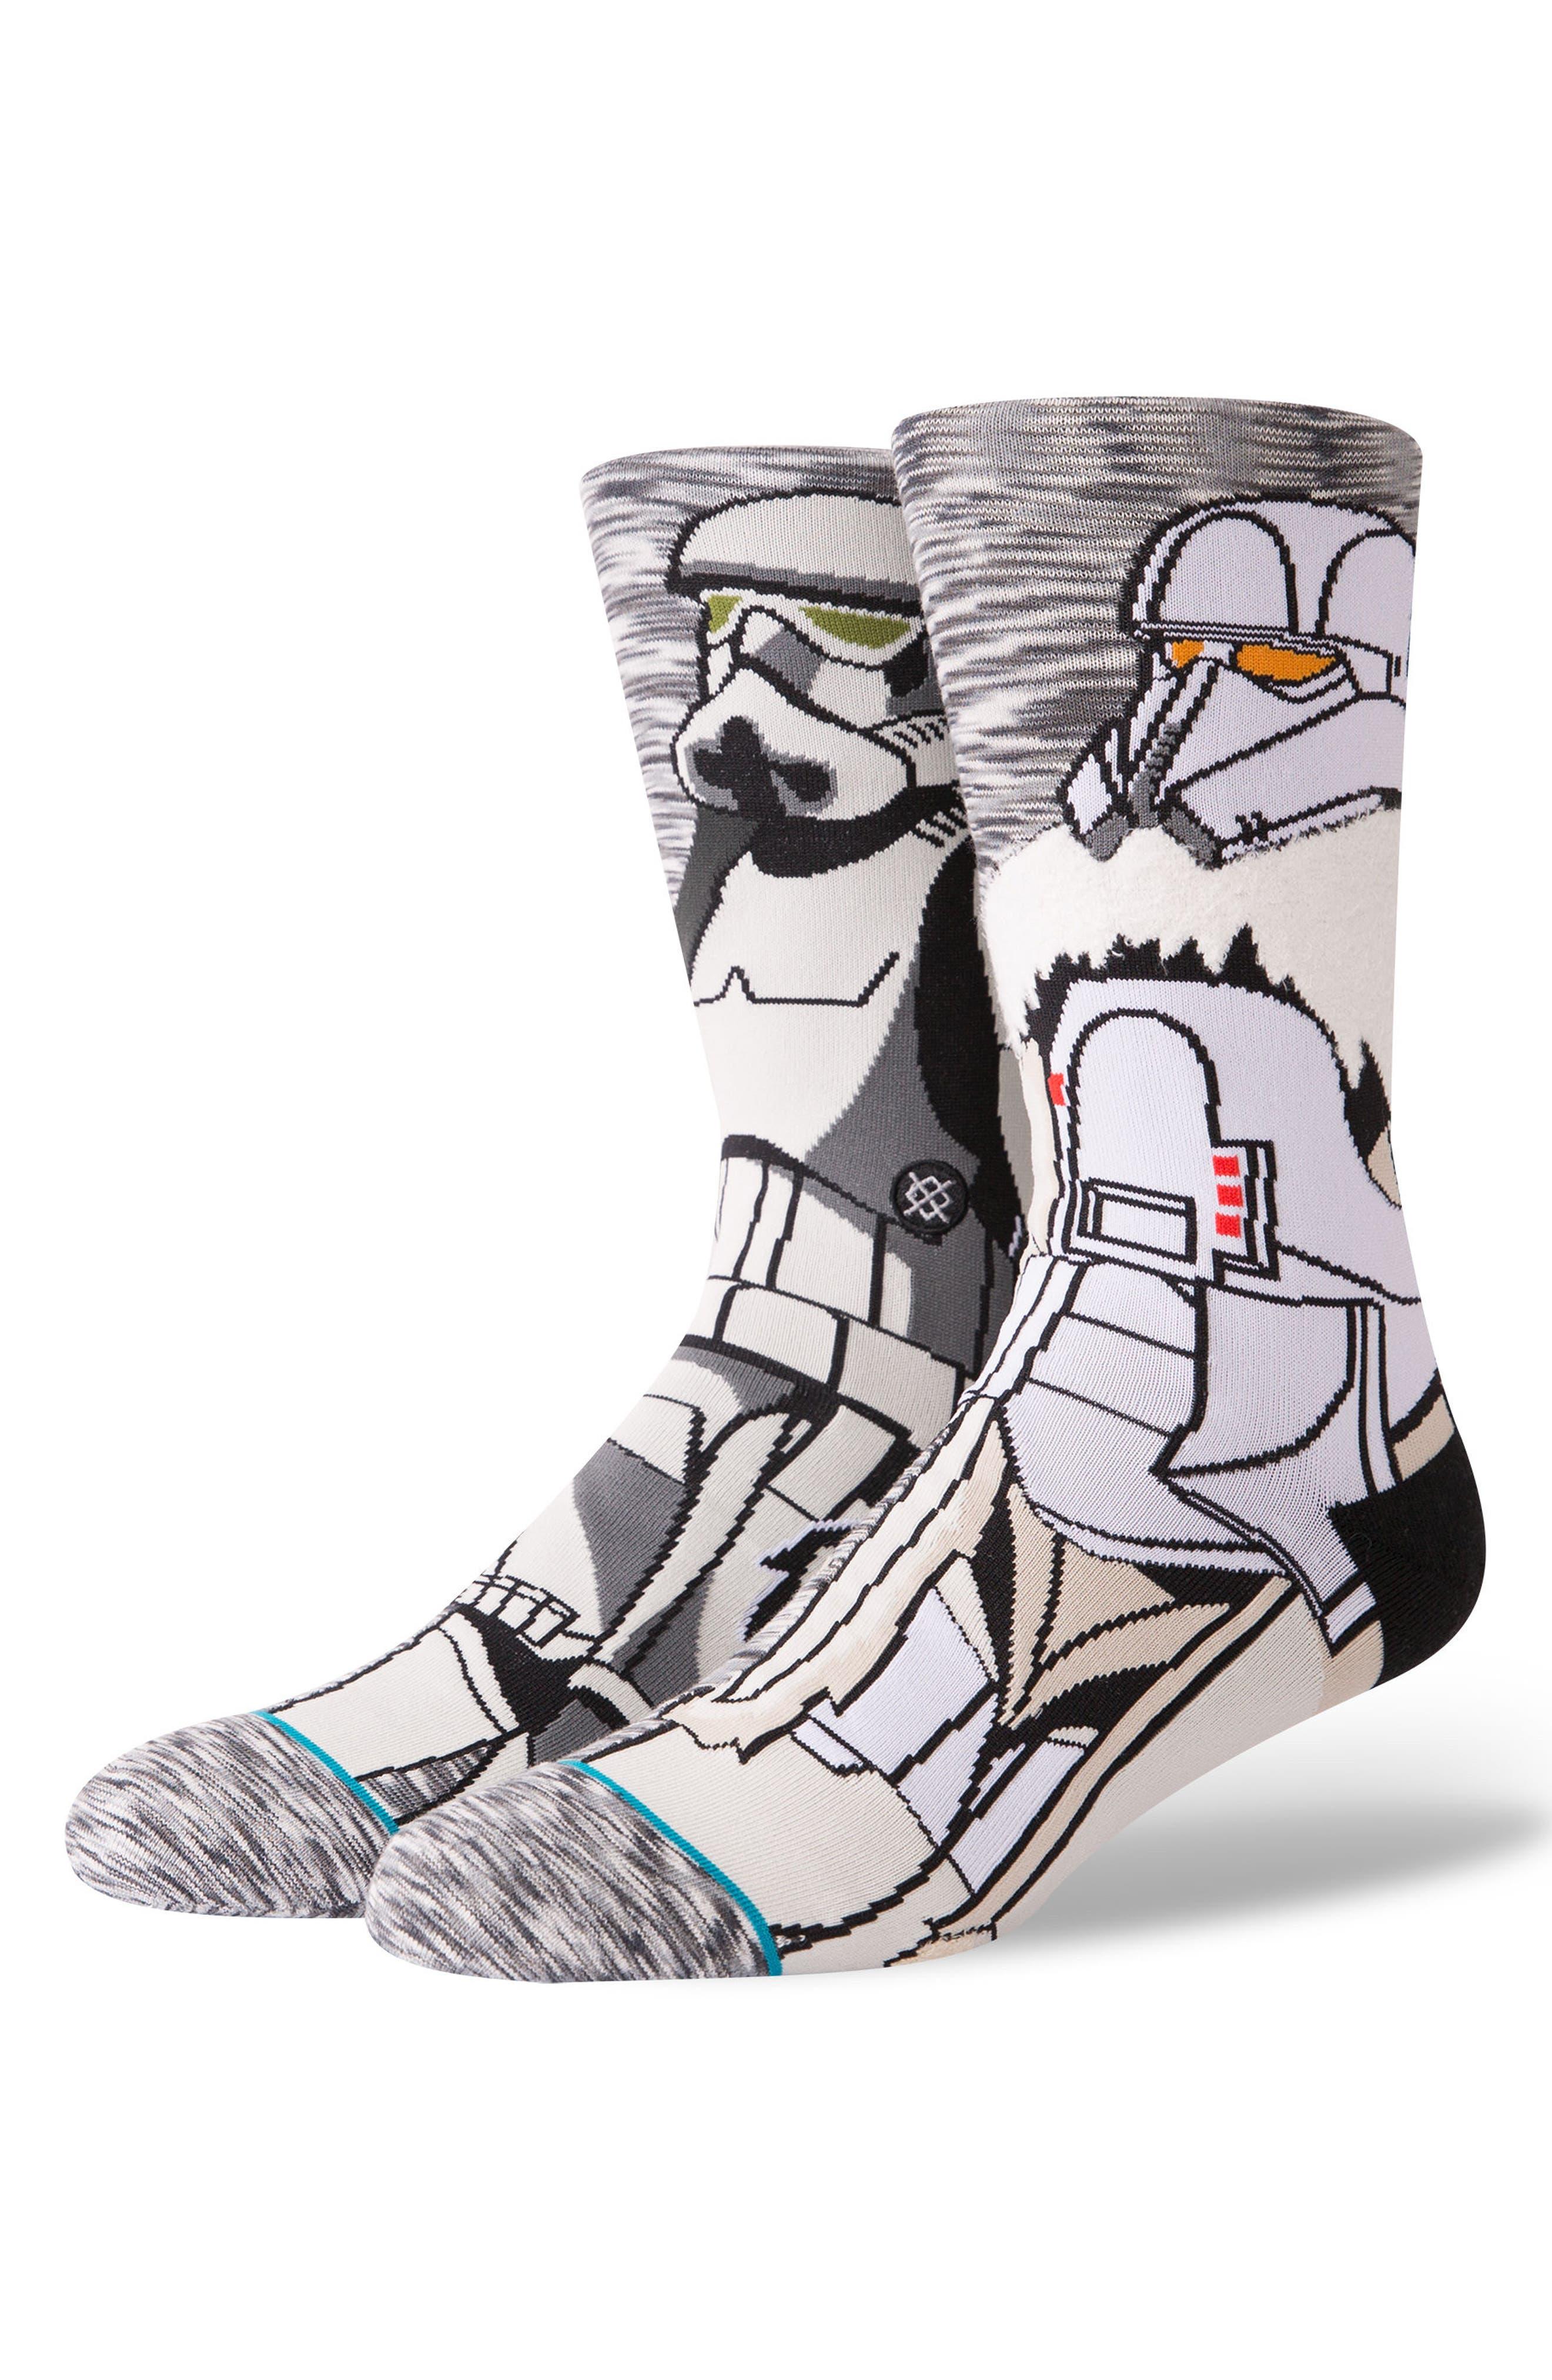 Star Wars Troop Socks,                             Main thumbnail 1, color,                             GREY